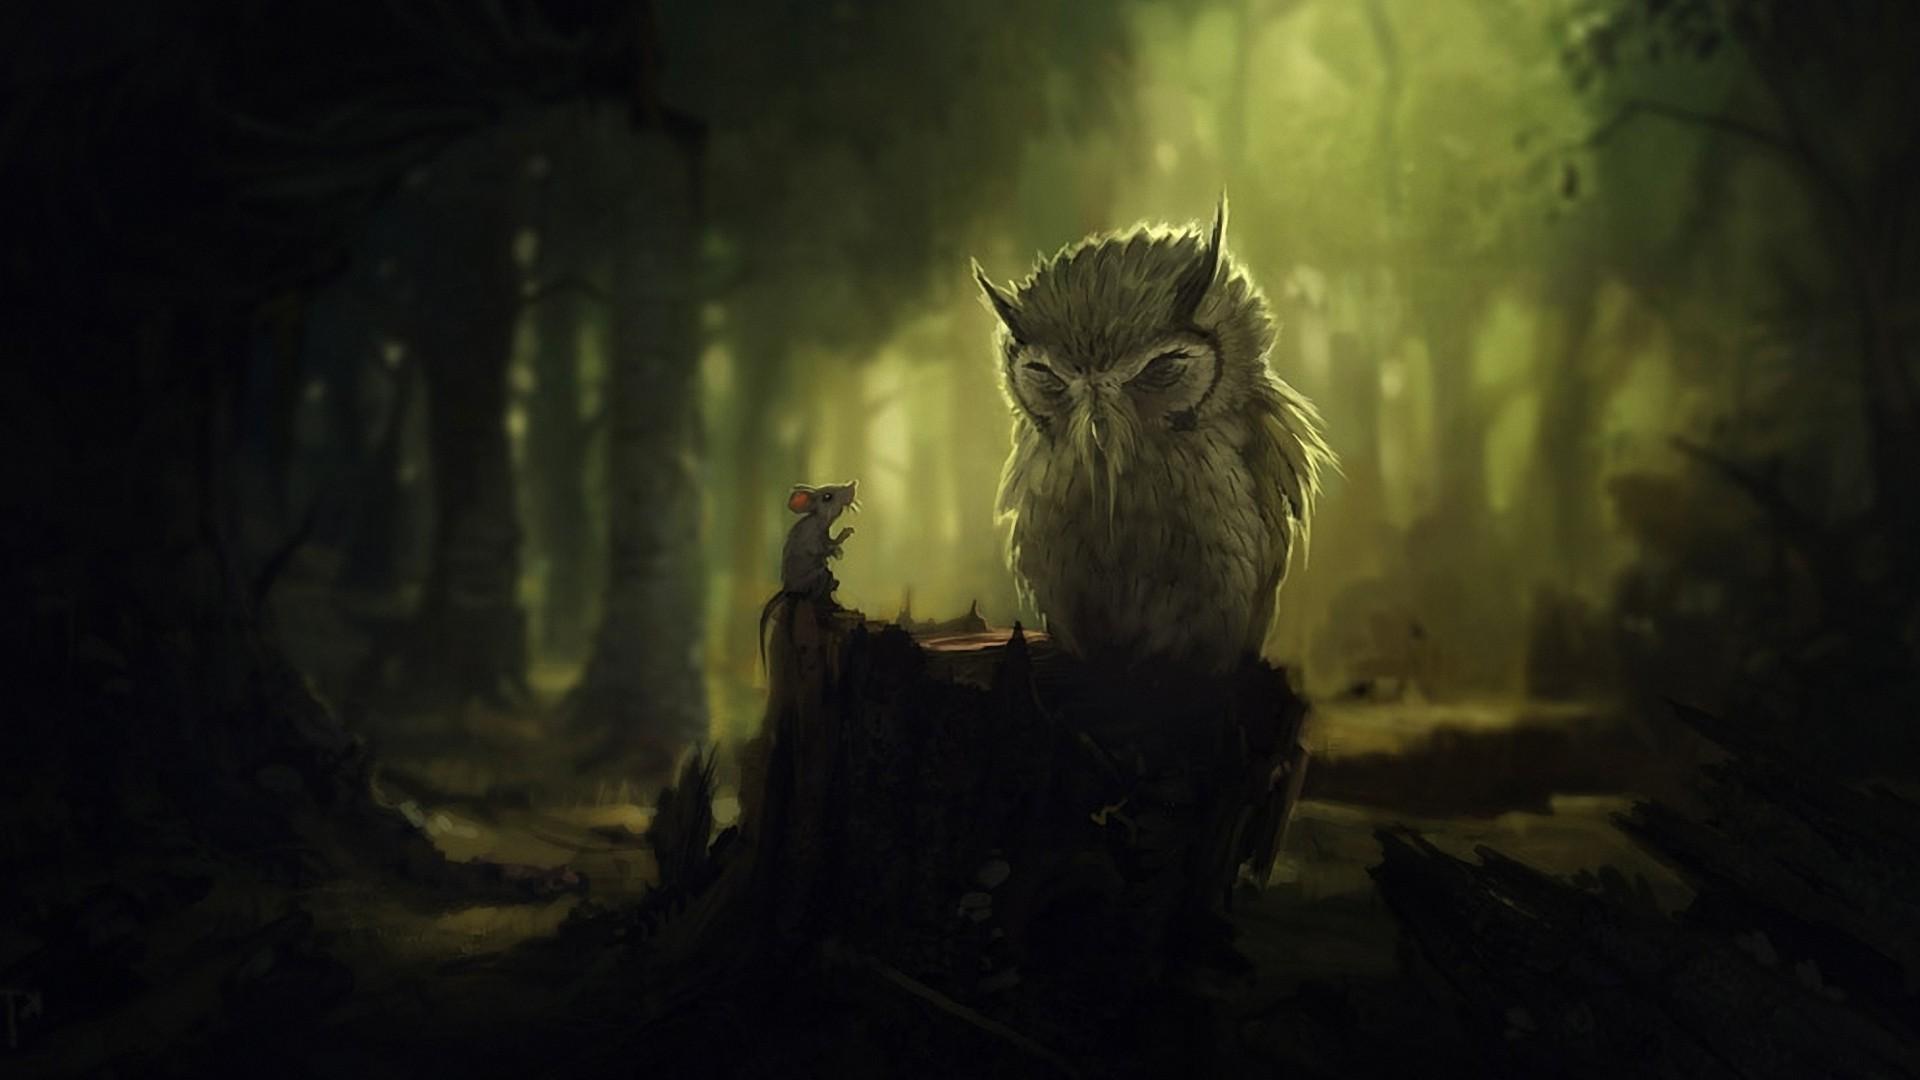 Owl Drk Wallpapers